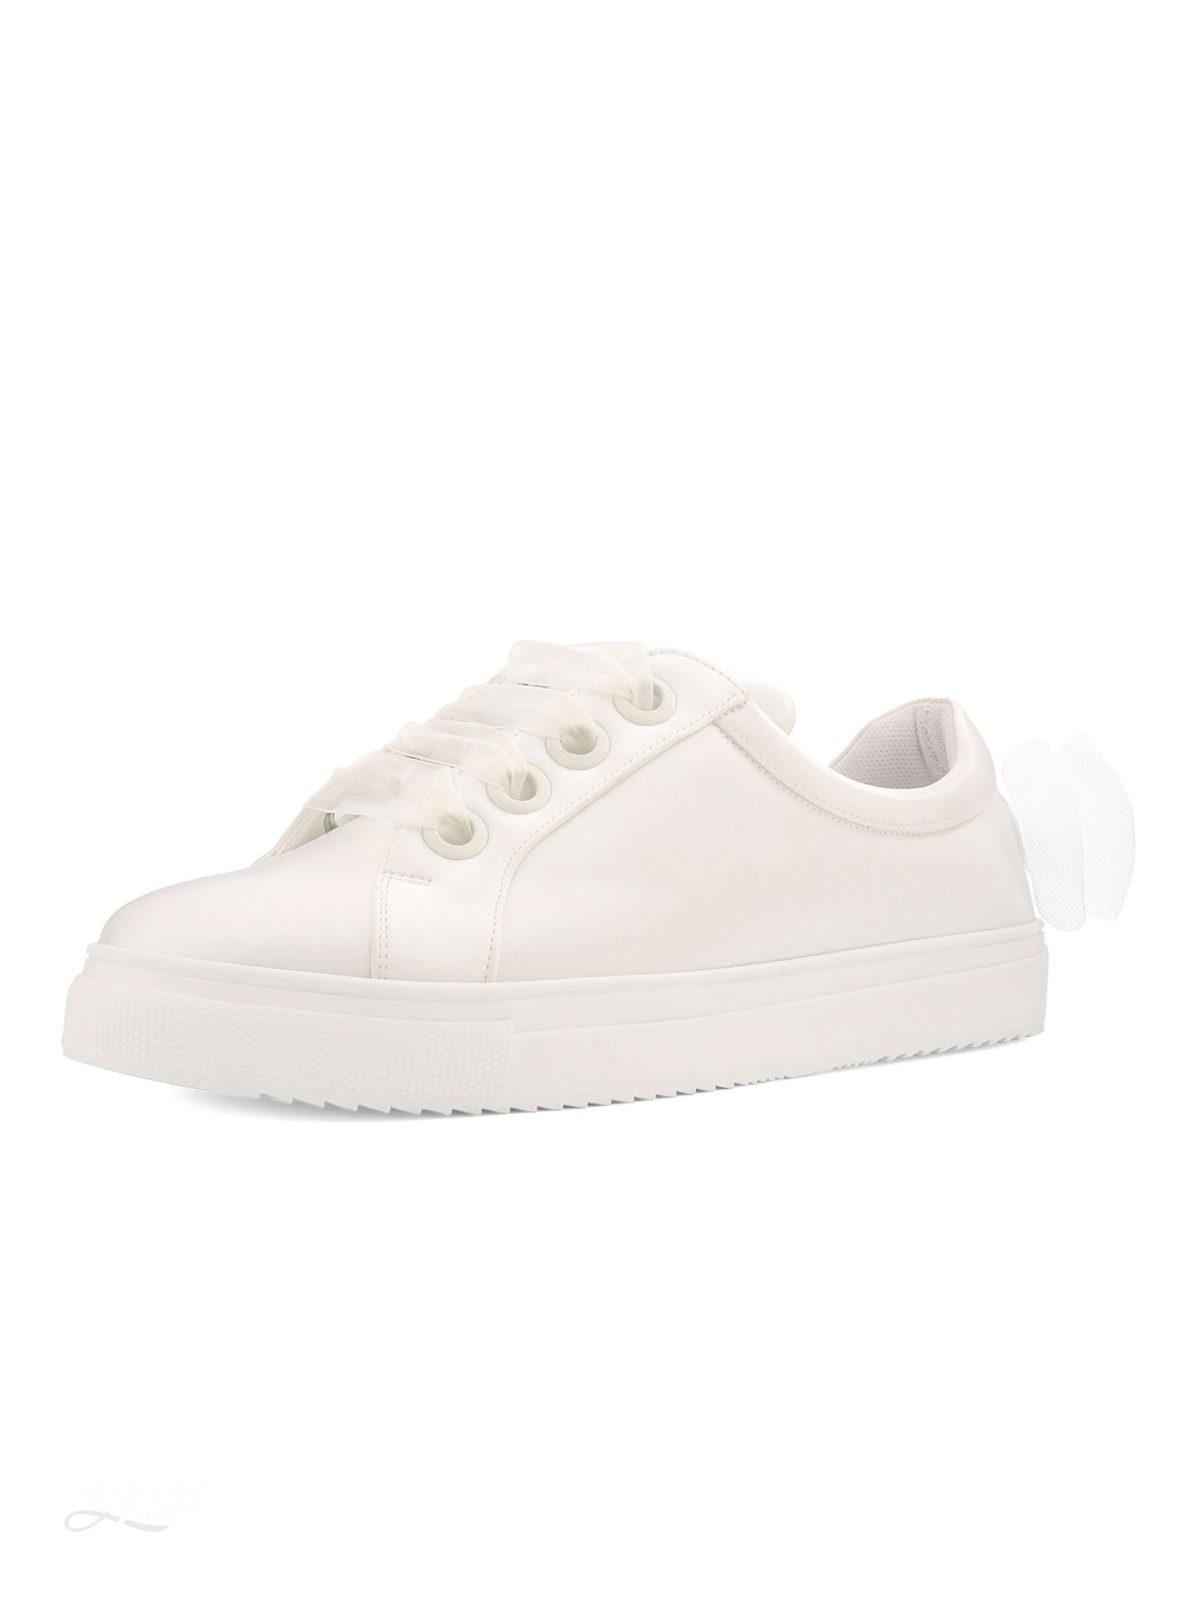 studioagnes-bridal-shoes_EMILY-(2)